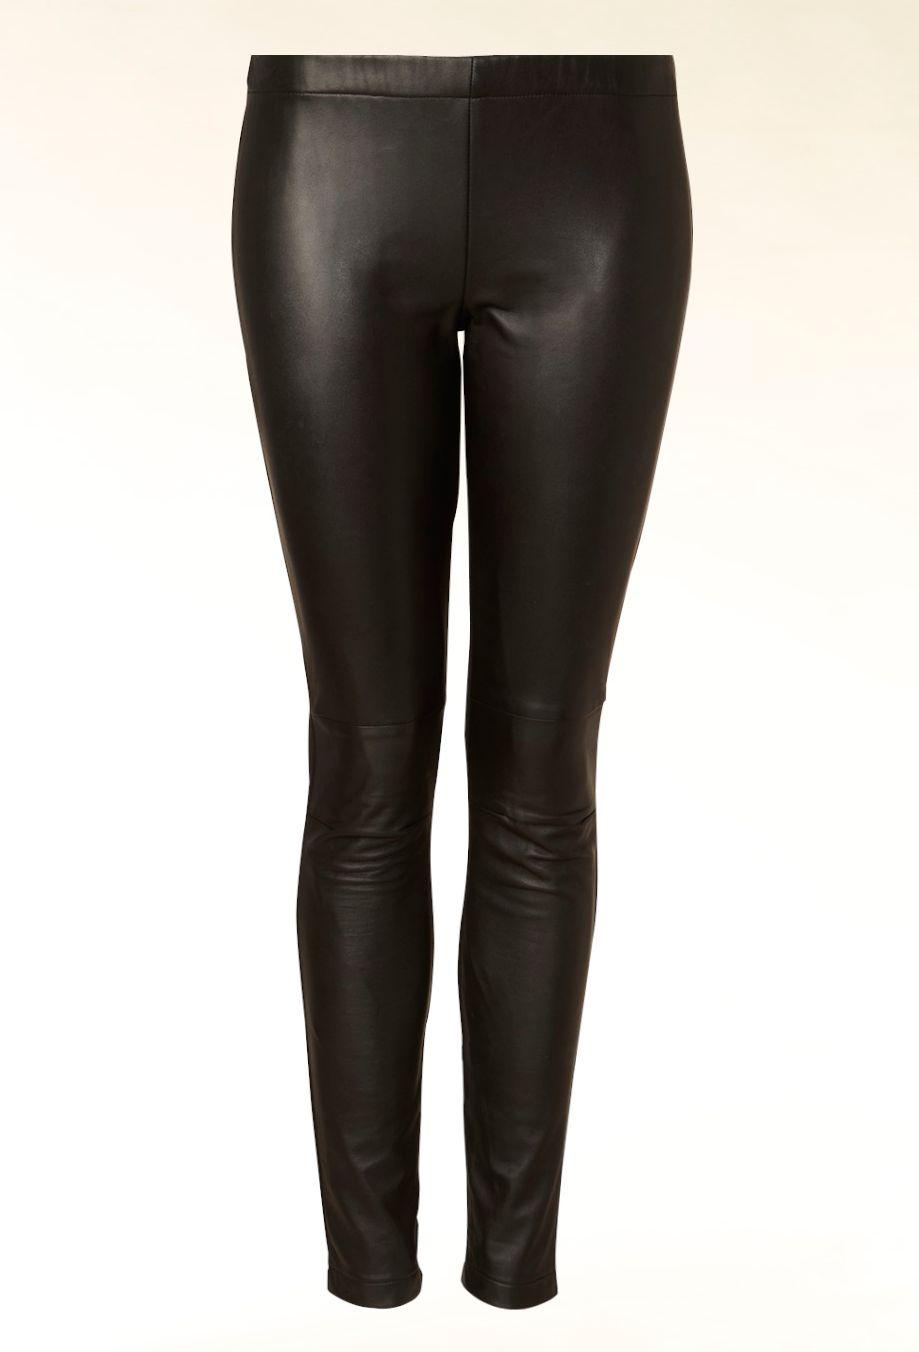 Hallhuber Leather front leggings Black - House of Fraser